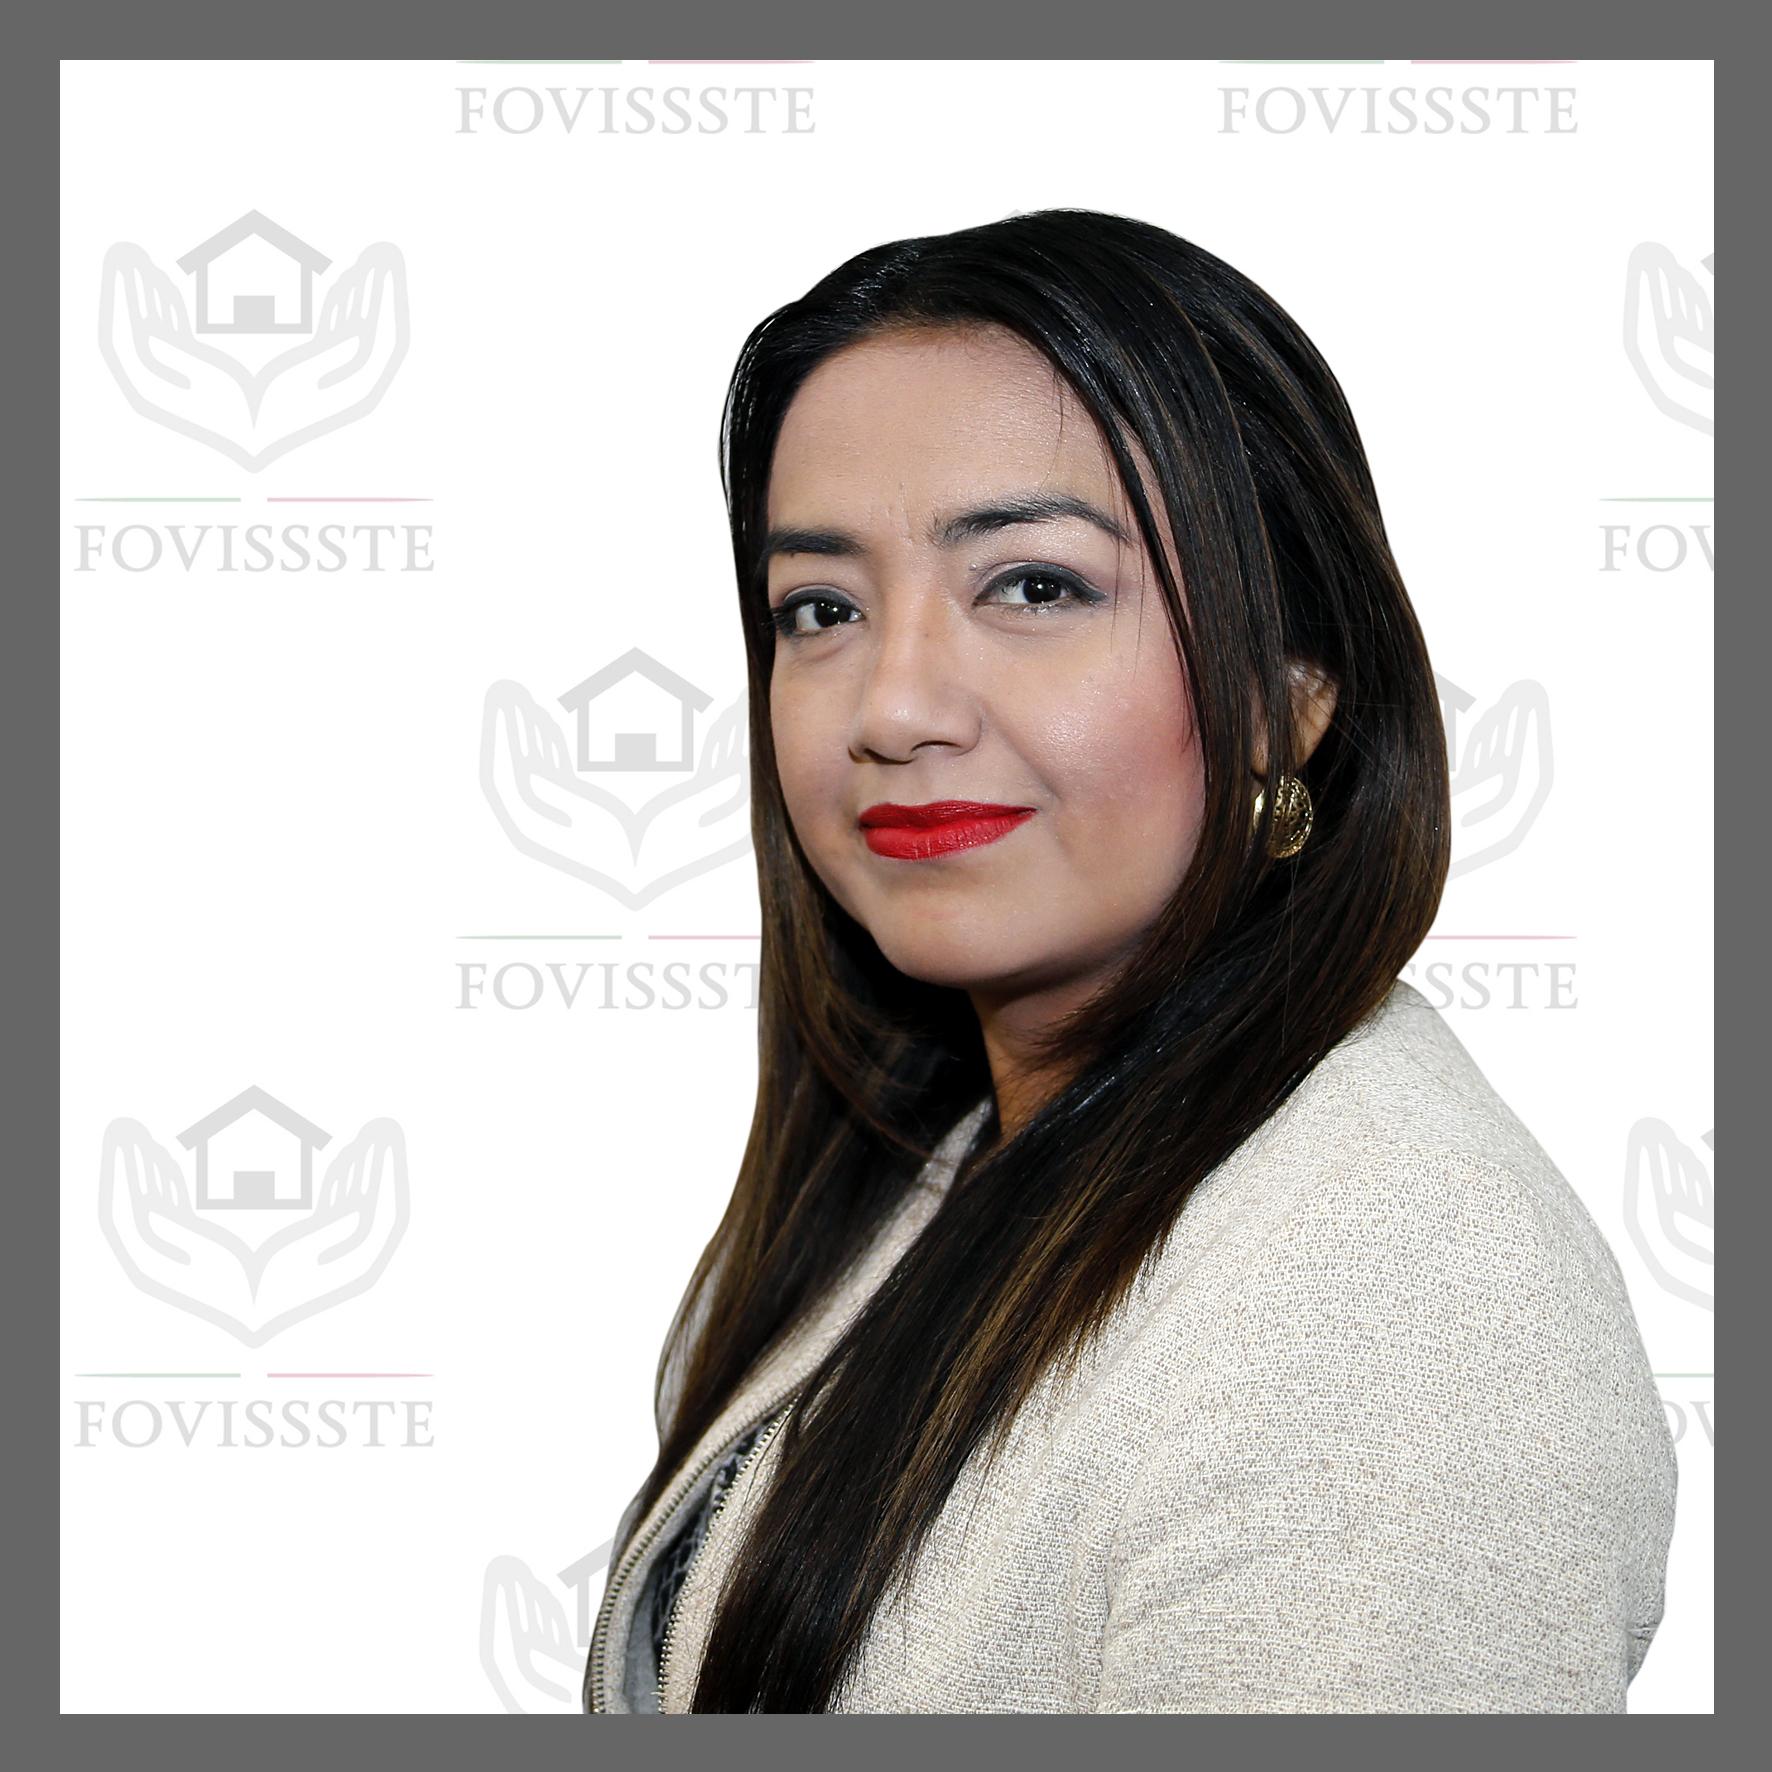 Mtra. Marisol Alicia Delgadillo Morales